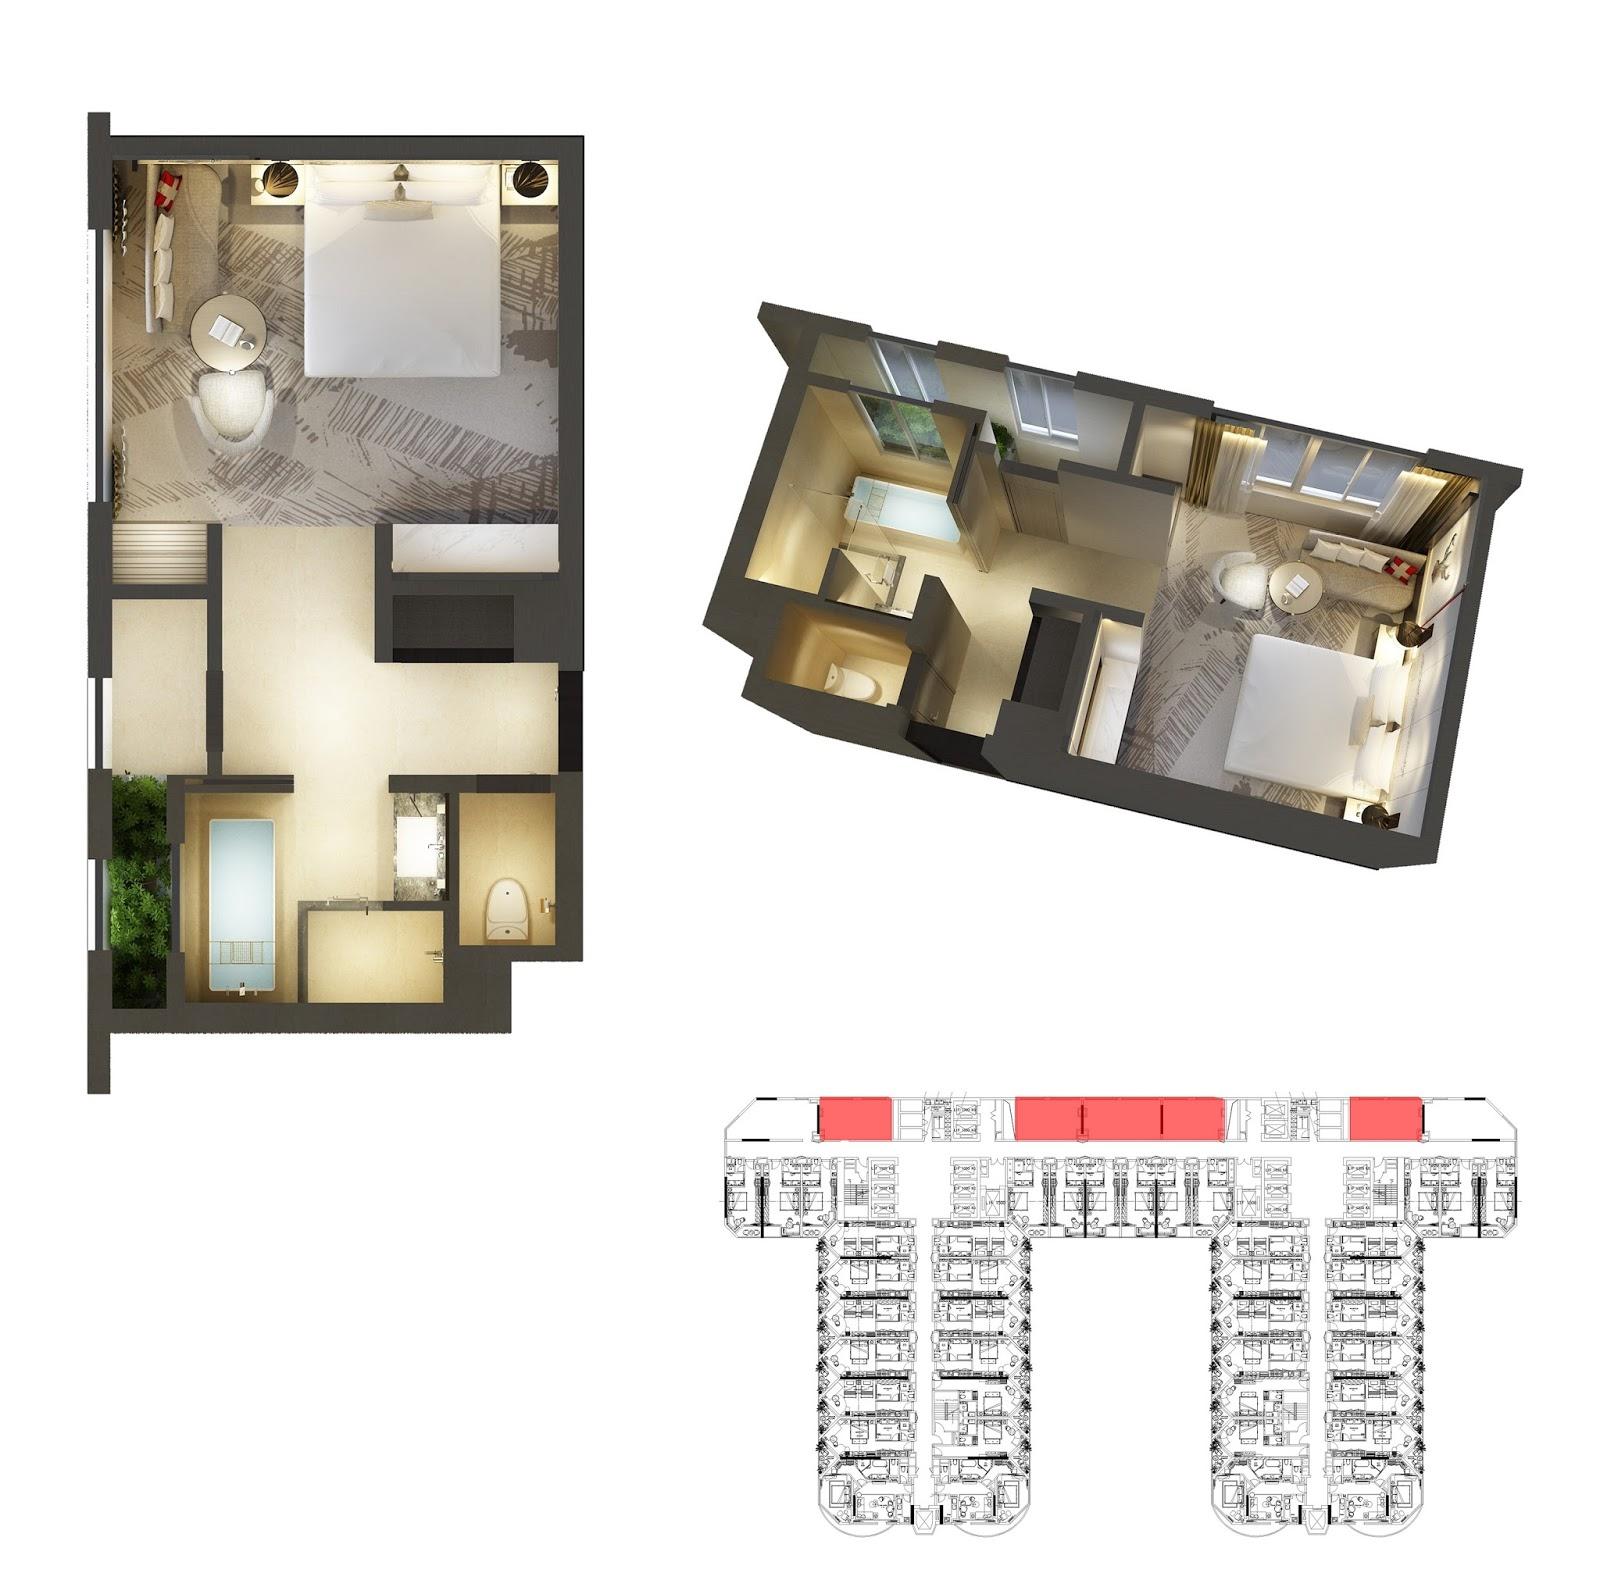 Thiết kế căn hộ số 9 La Luna Resort Nha Trang